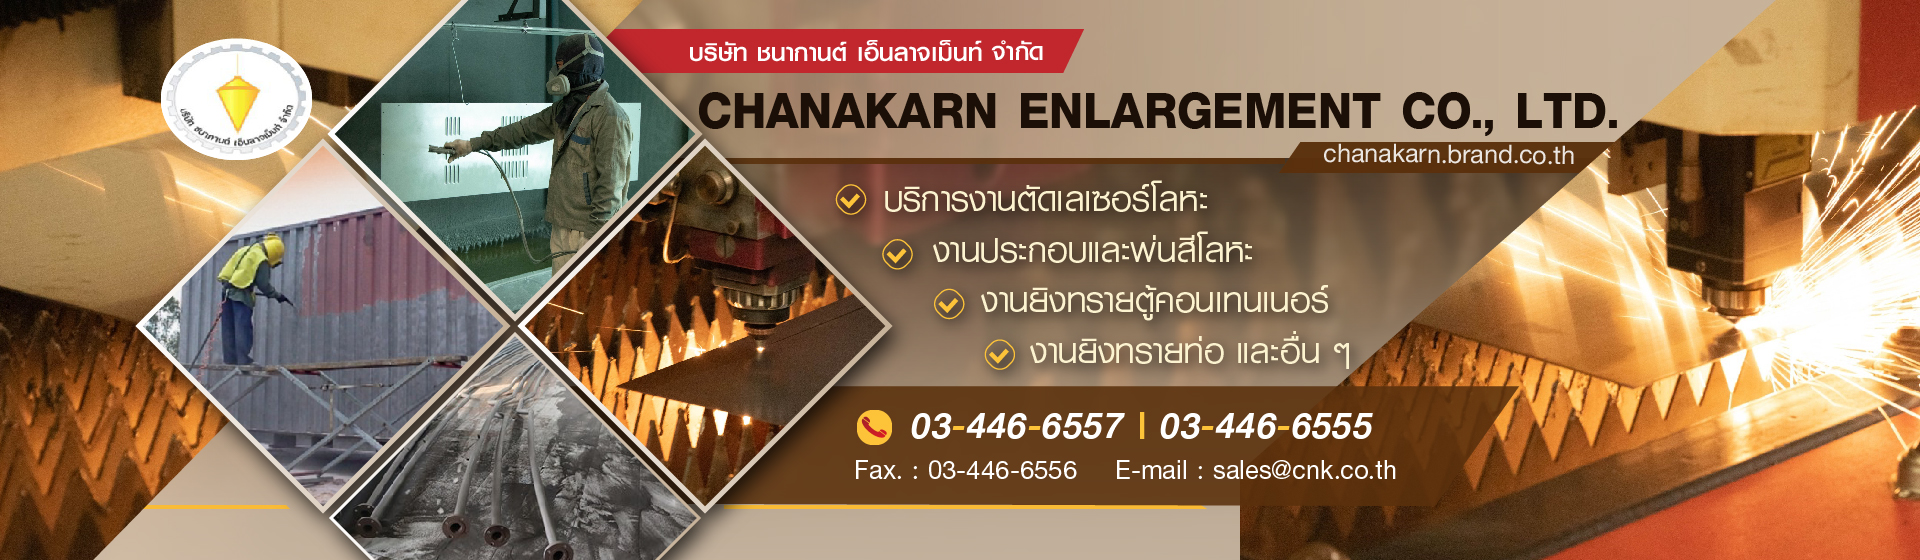 https://www.chanakarn-enlargement.com/TH/Home